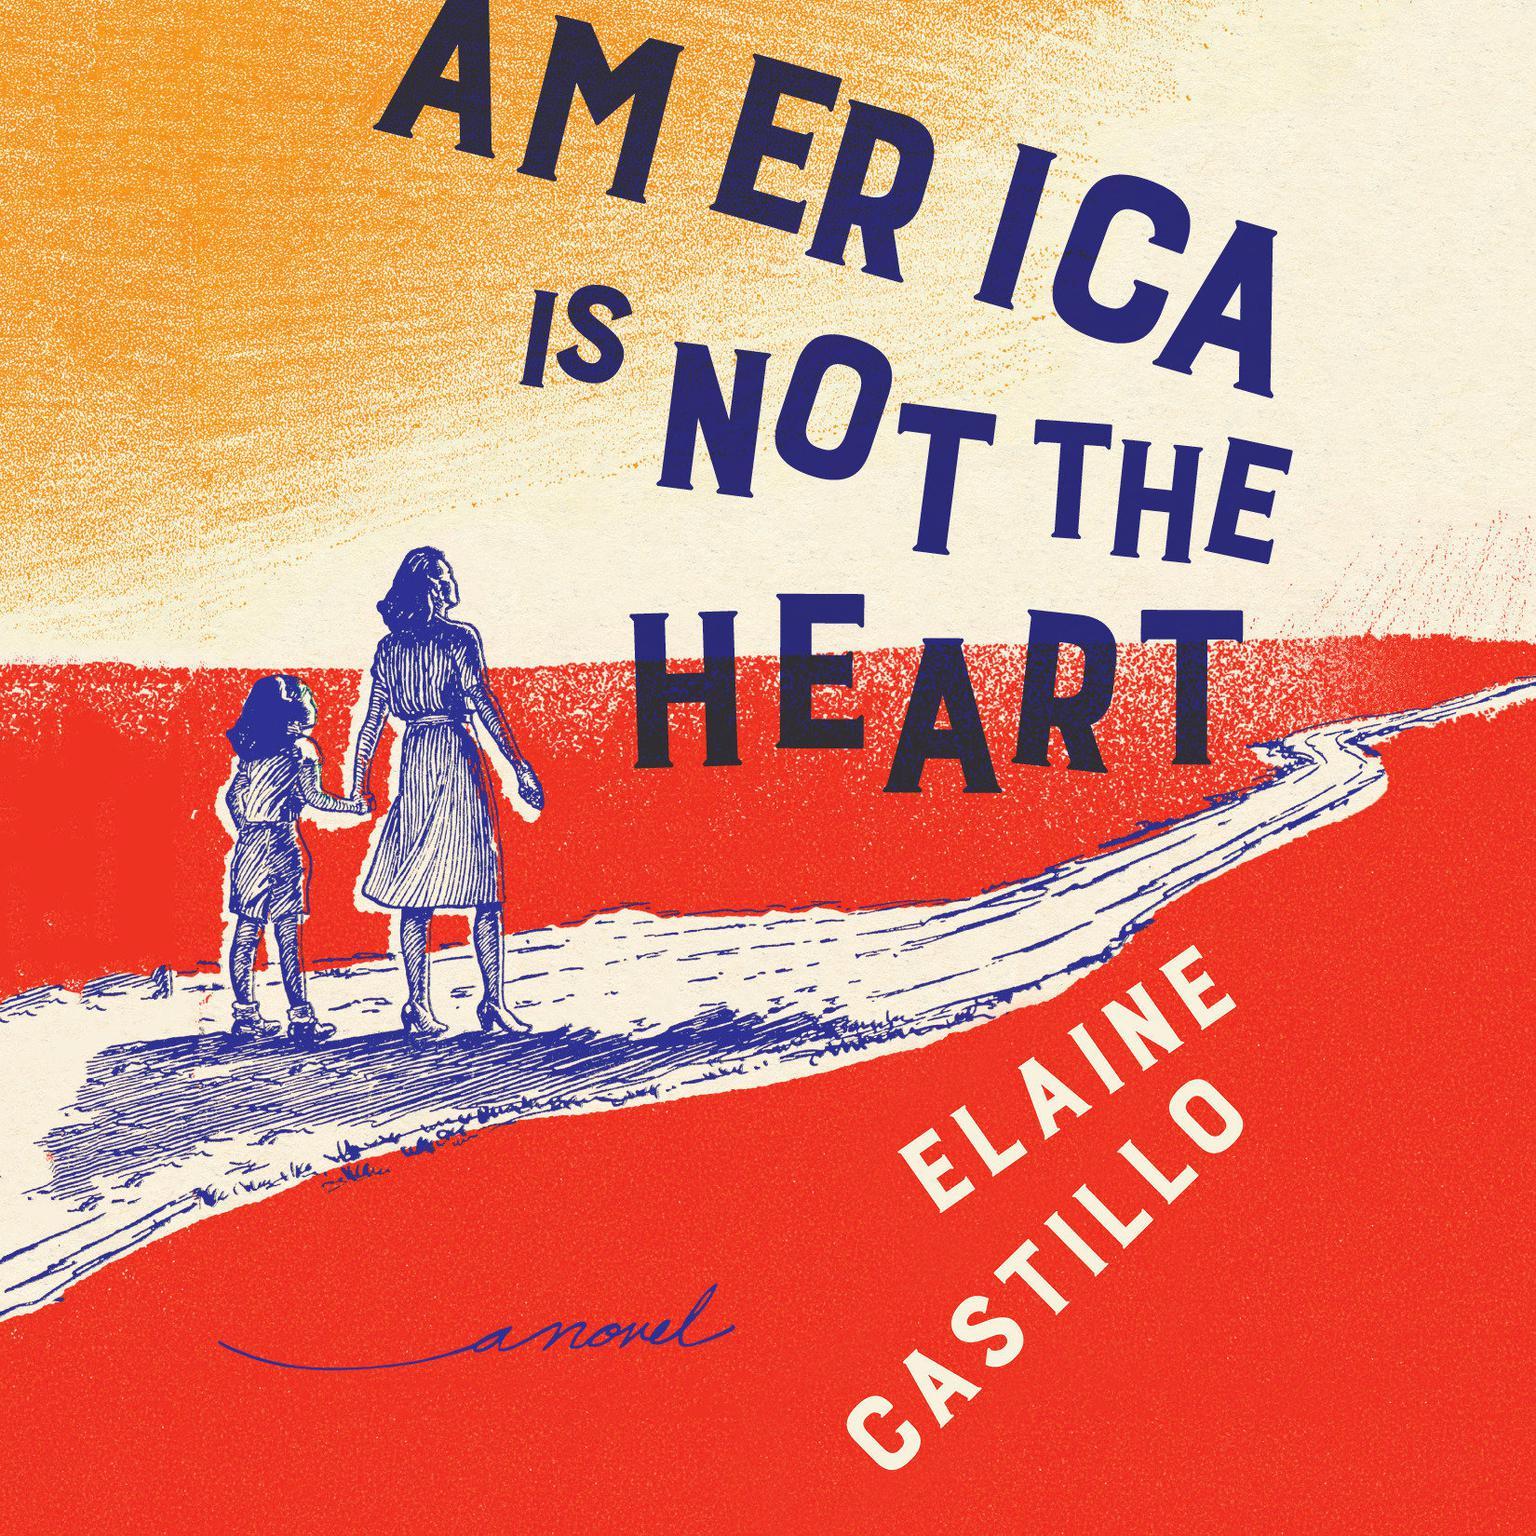 America Is Not the Heart: A Novel Audiobook, by Elaine Castillo